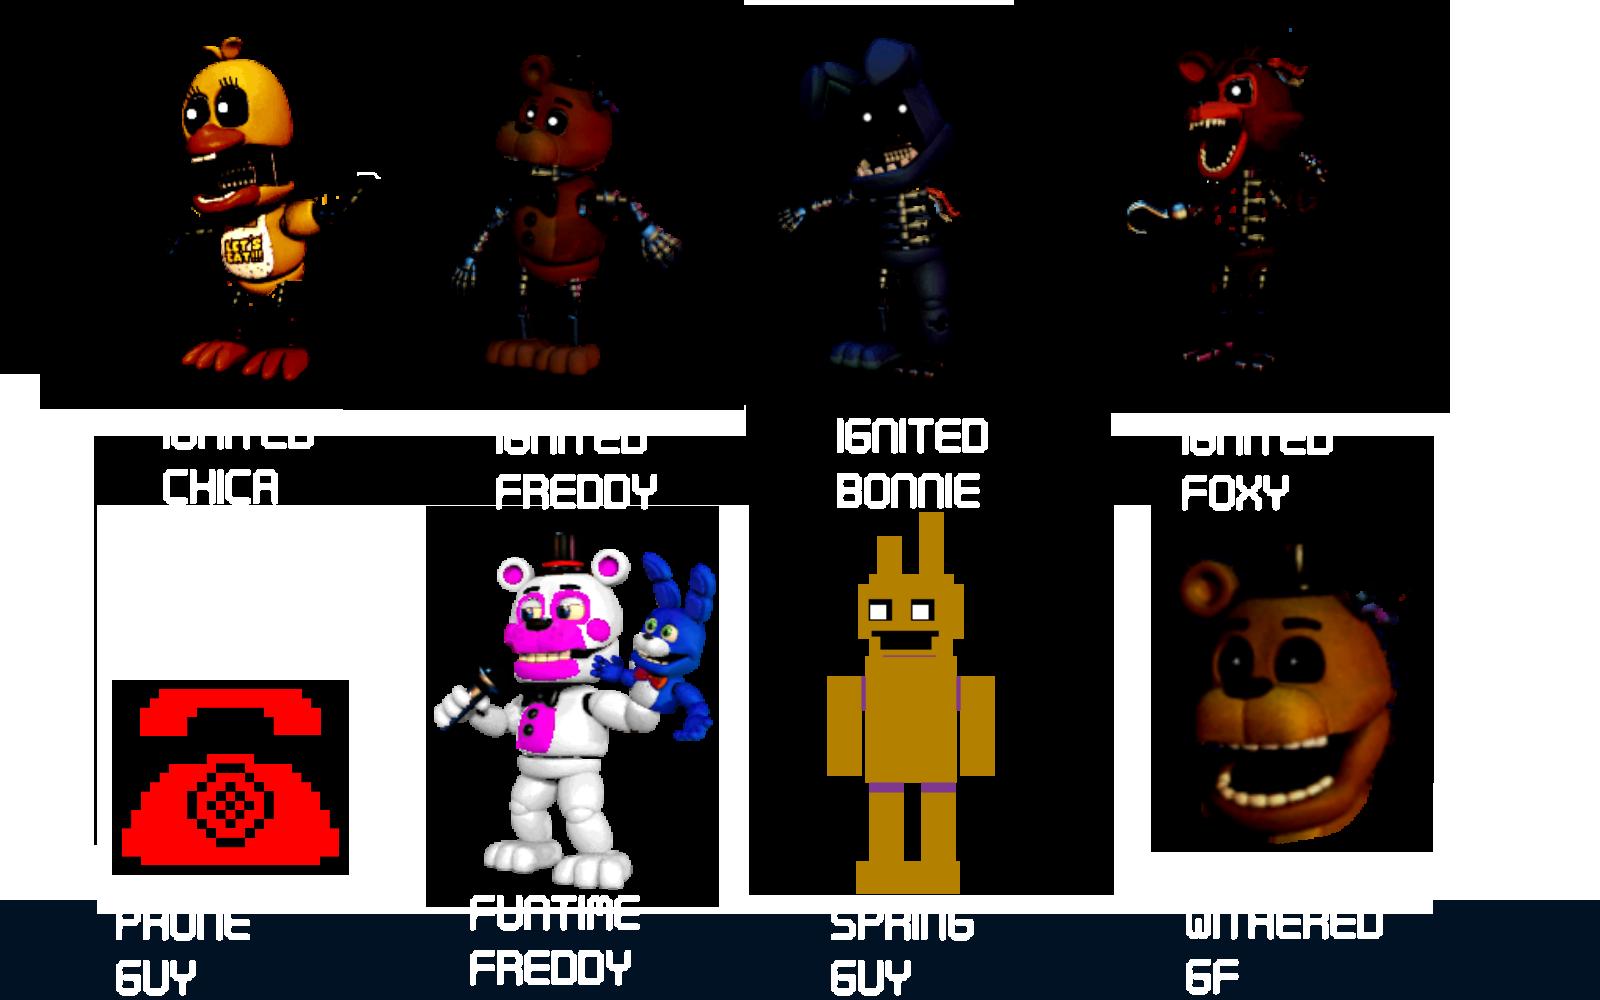 Fnaf world character designs by domobfdi on deviantart